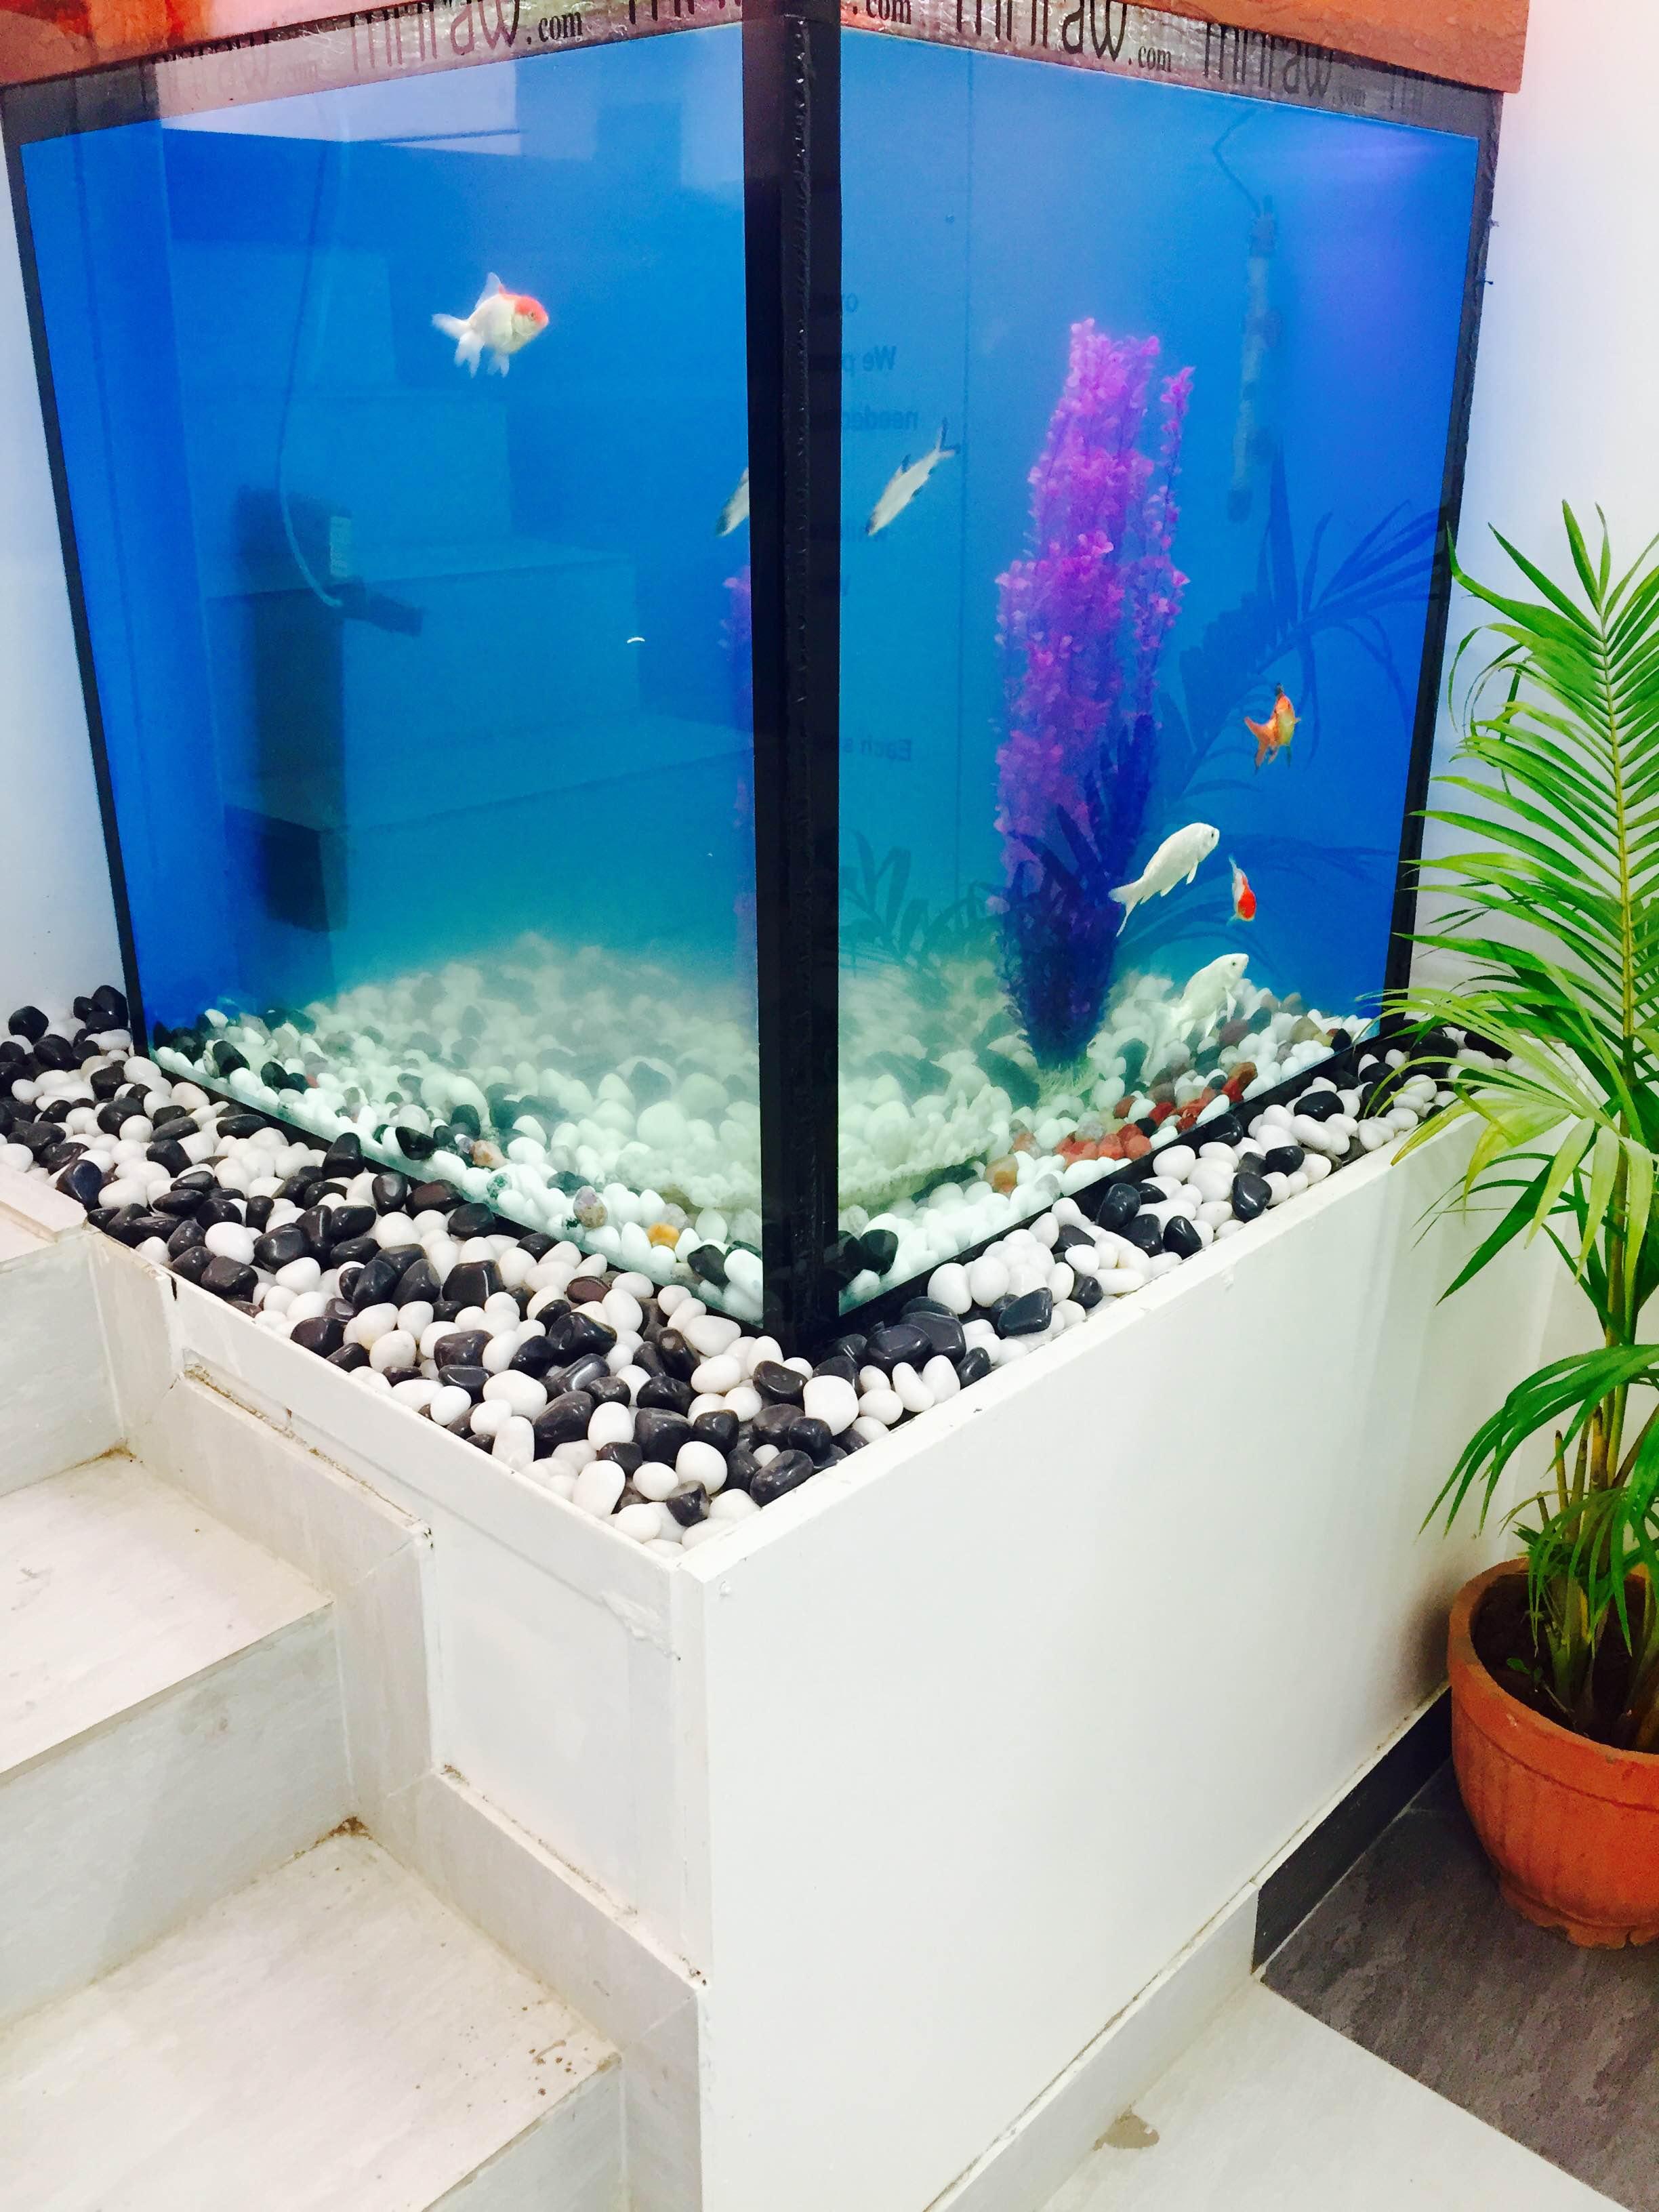 Fish aquarium in surat timings - Dental Surgeons In Pimple Saudagar Pune Instant Appointment Booking View Fees Feedbacks Practo